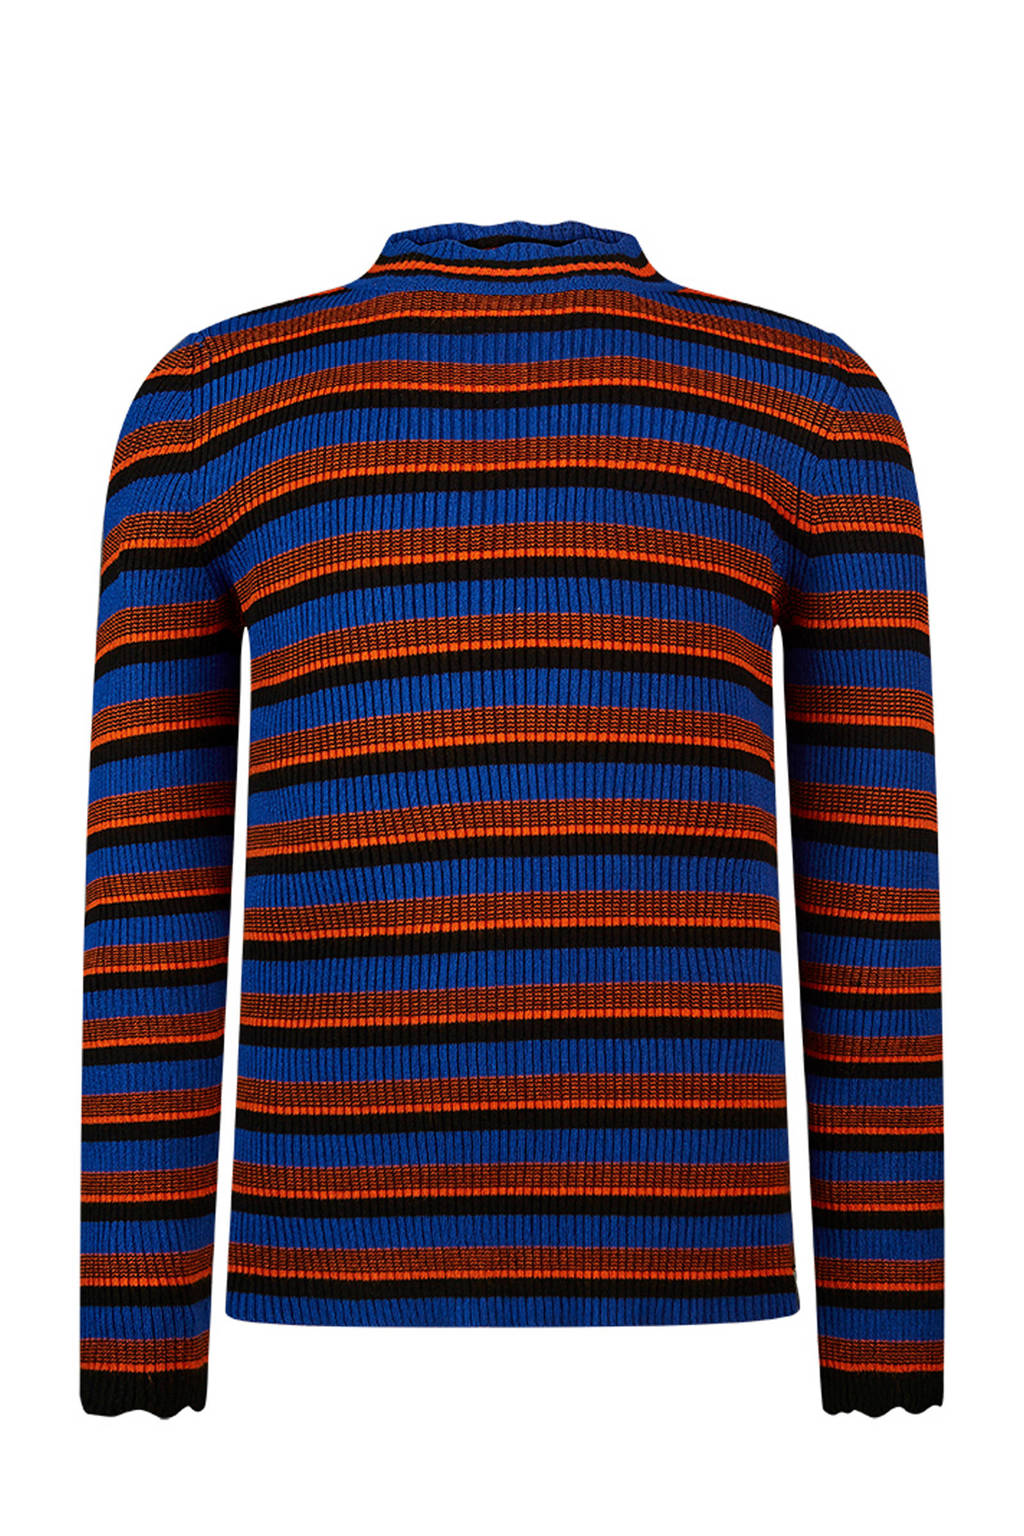 Retour Denim gestreepte trui Kiki blauw/rood, Blauw/rood